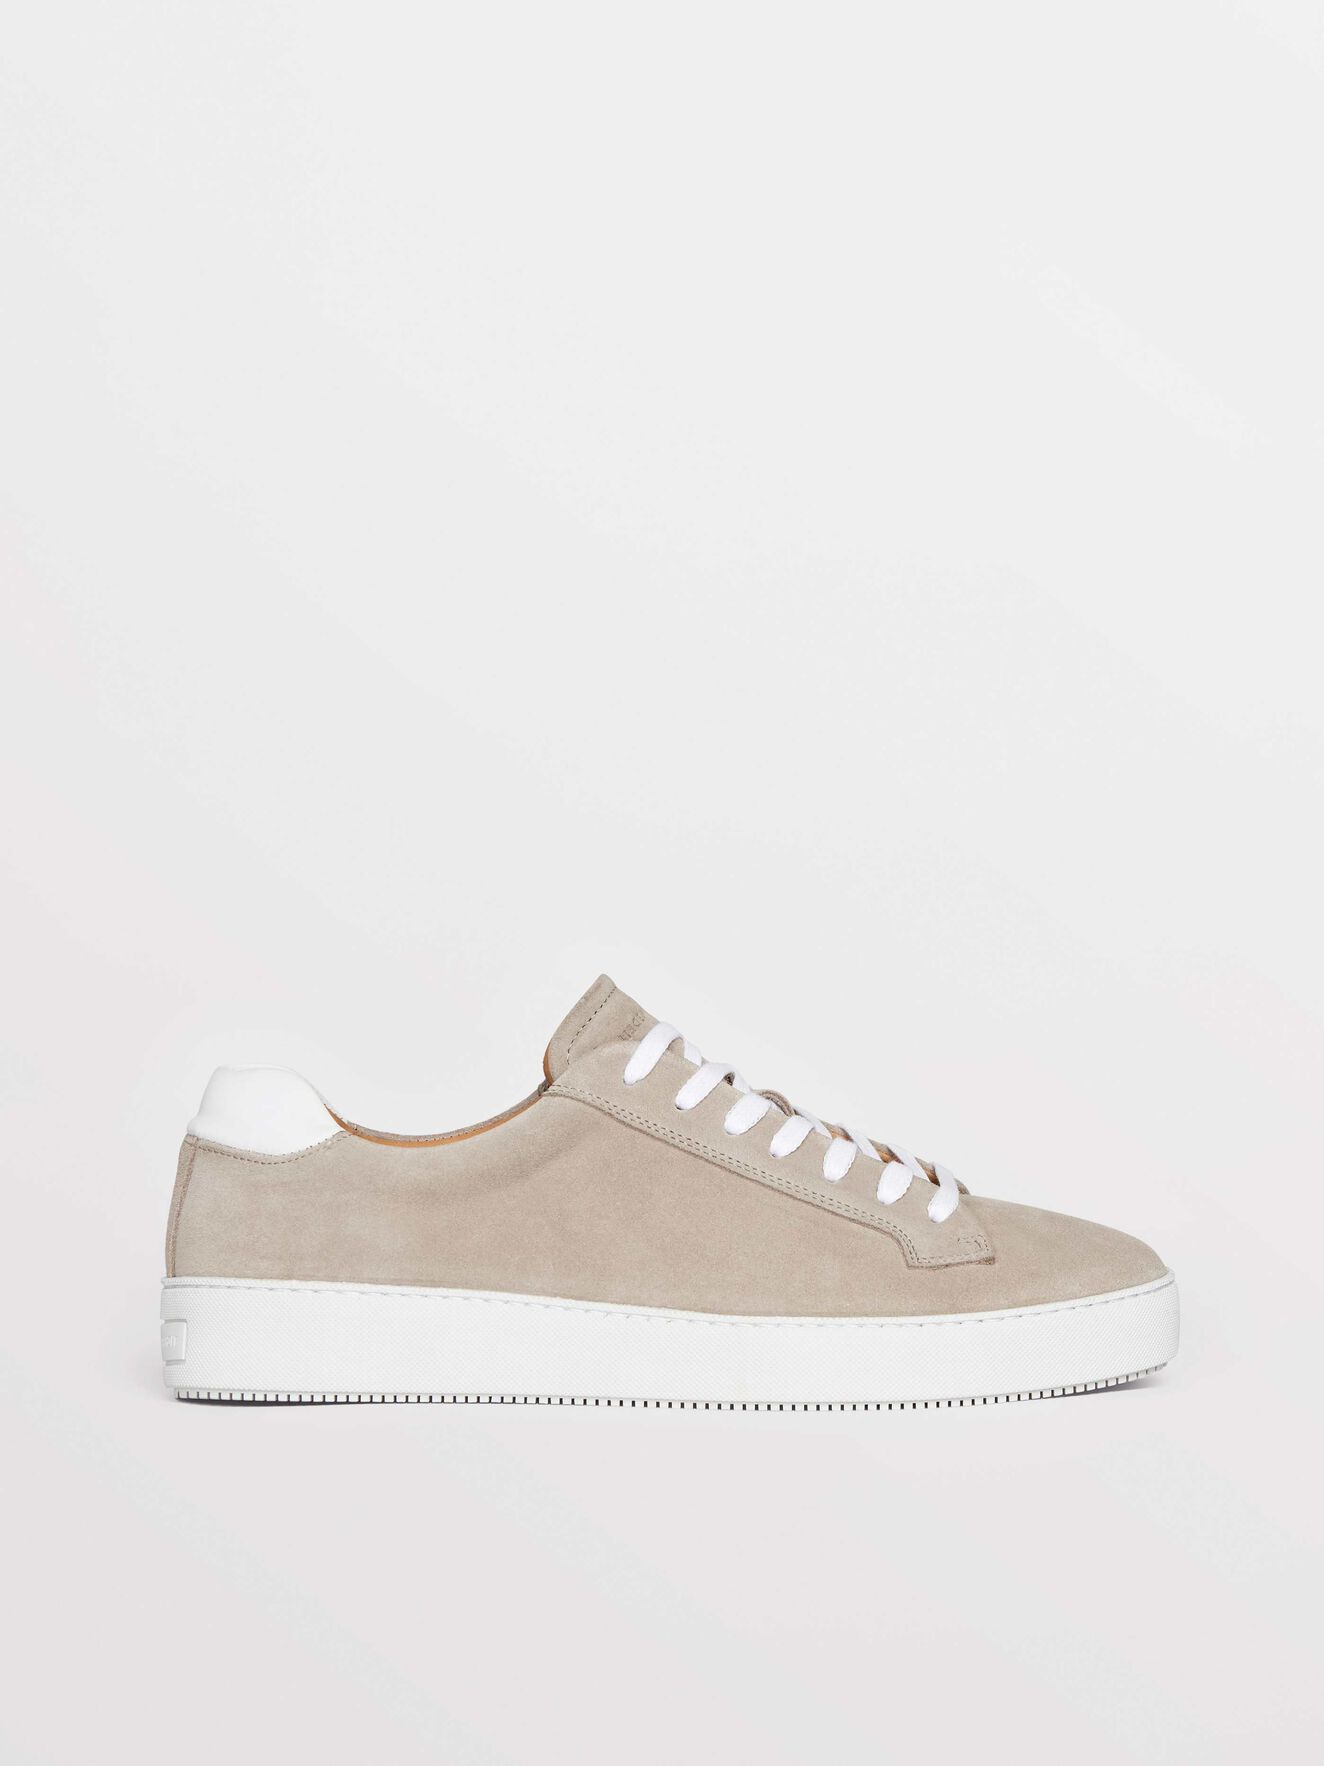 9592605c97b4 Salas S Sneakers in Tehina from Tiger of Sweden